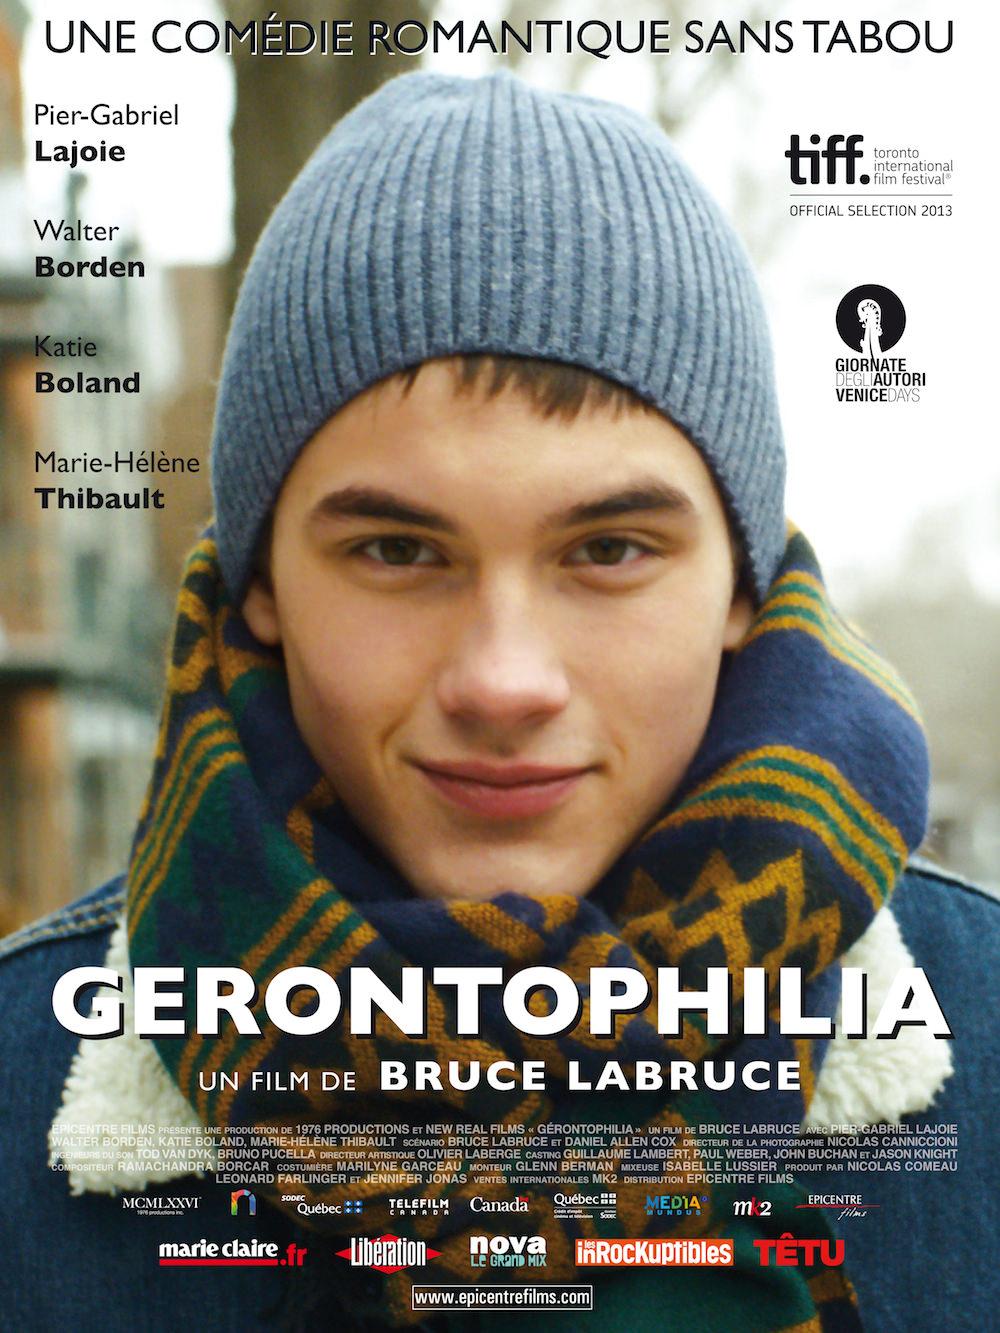 Gerontophilia labruce